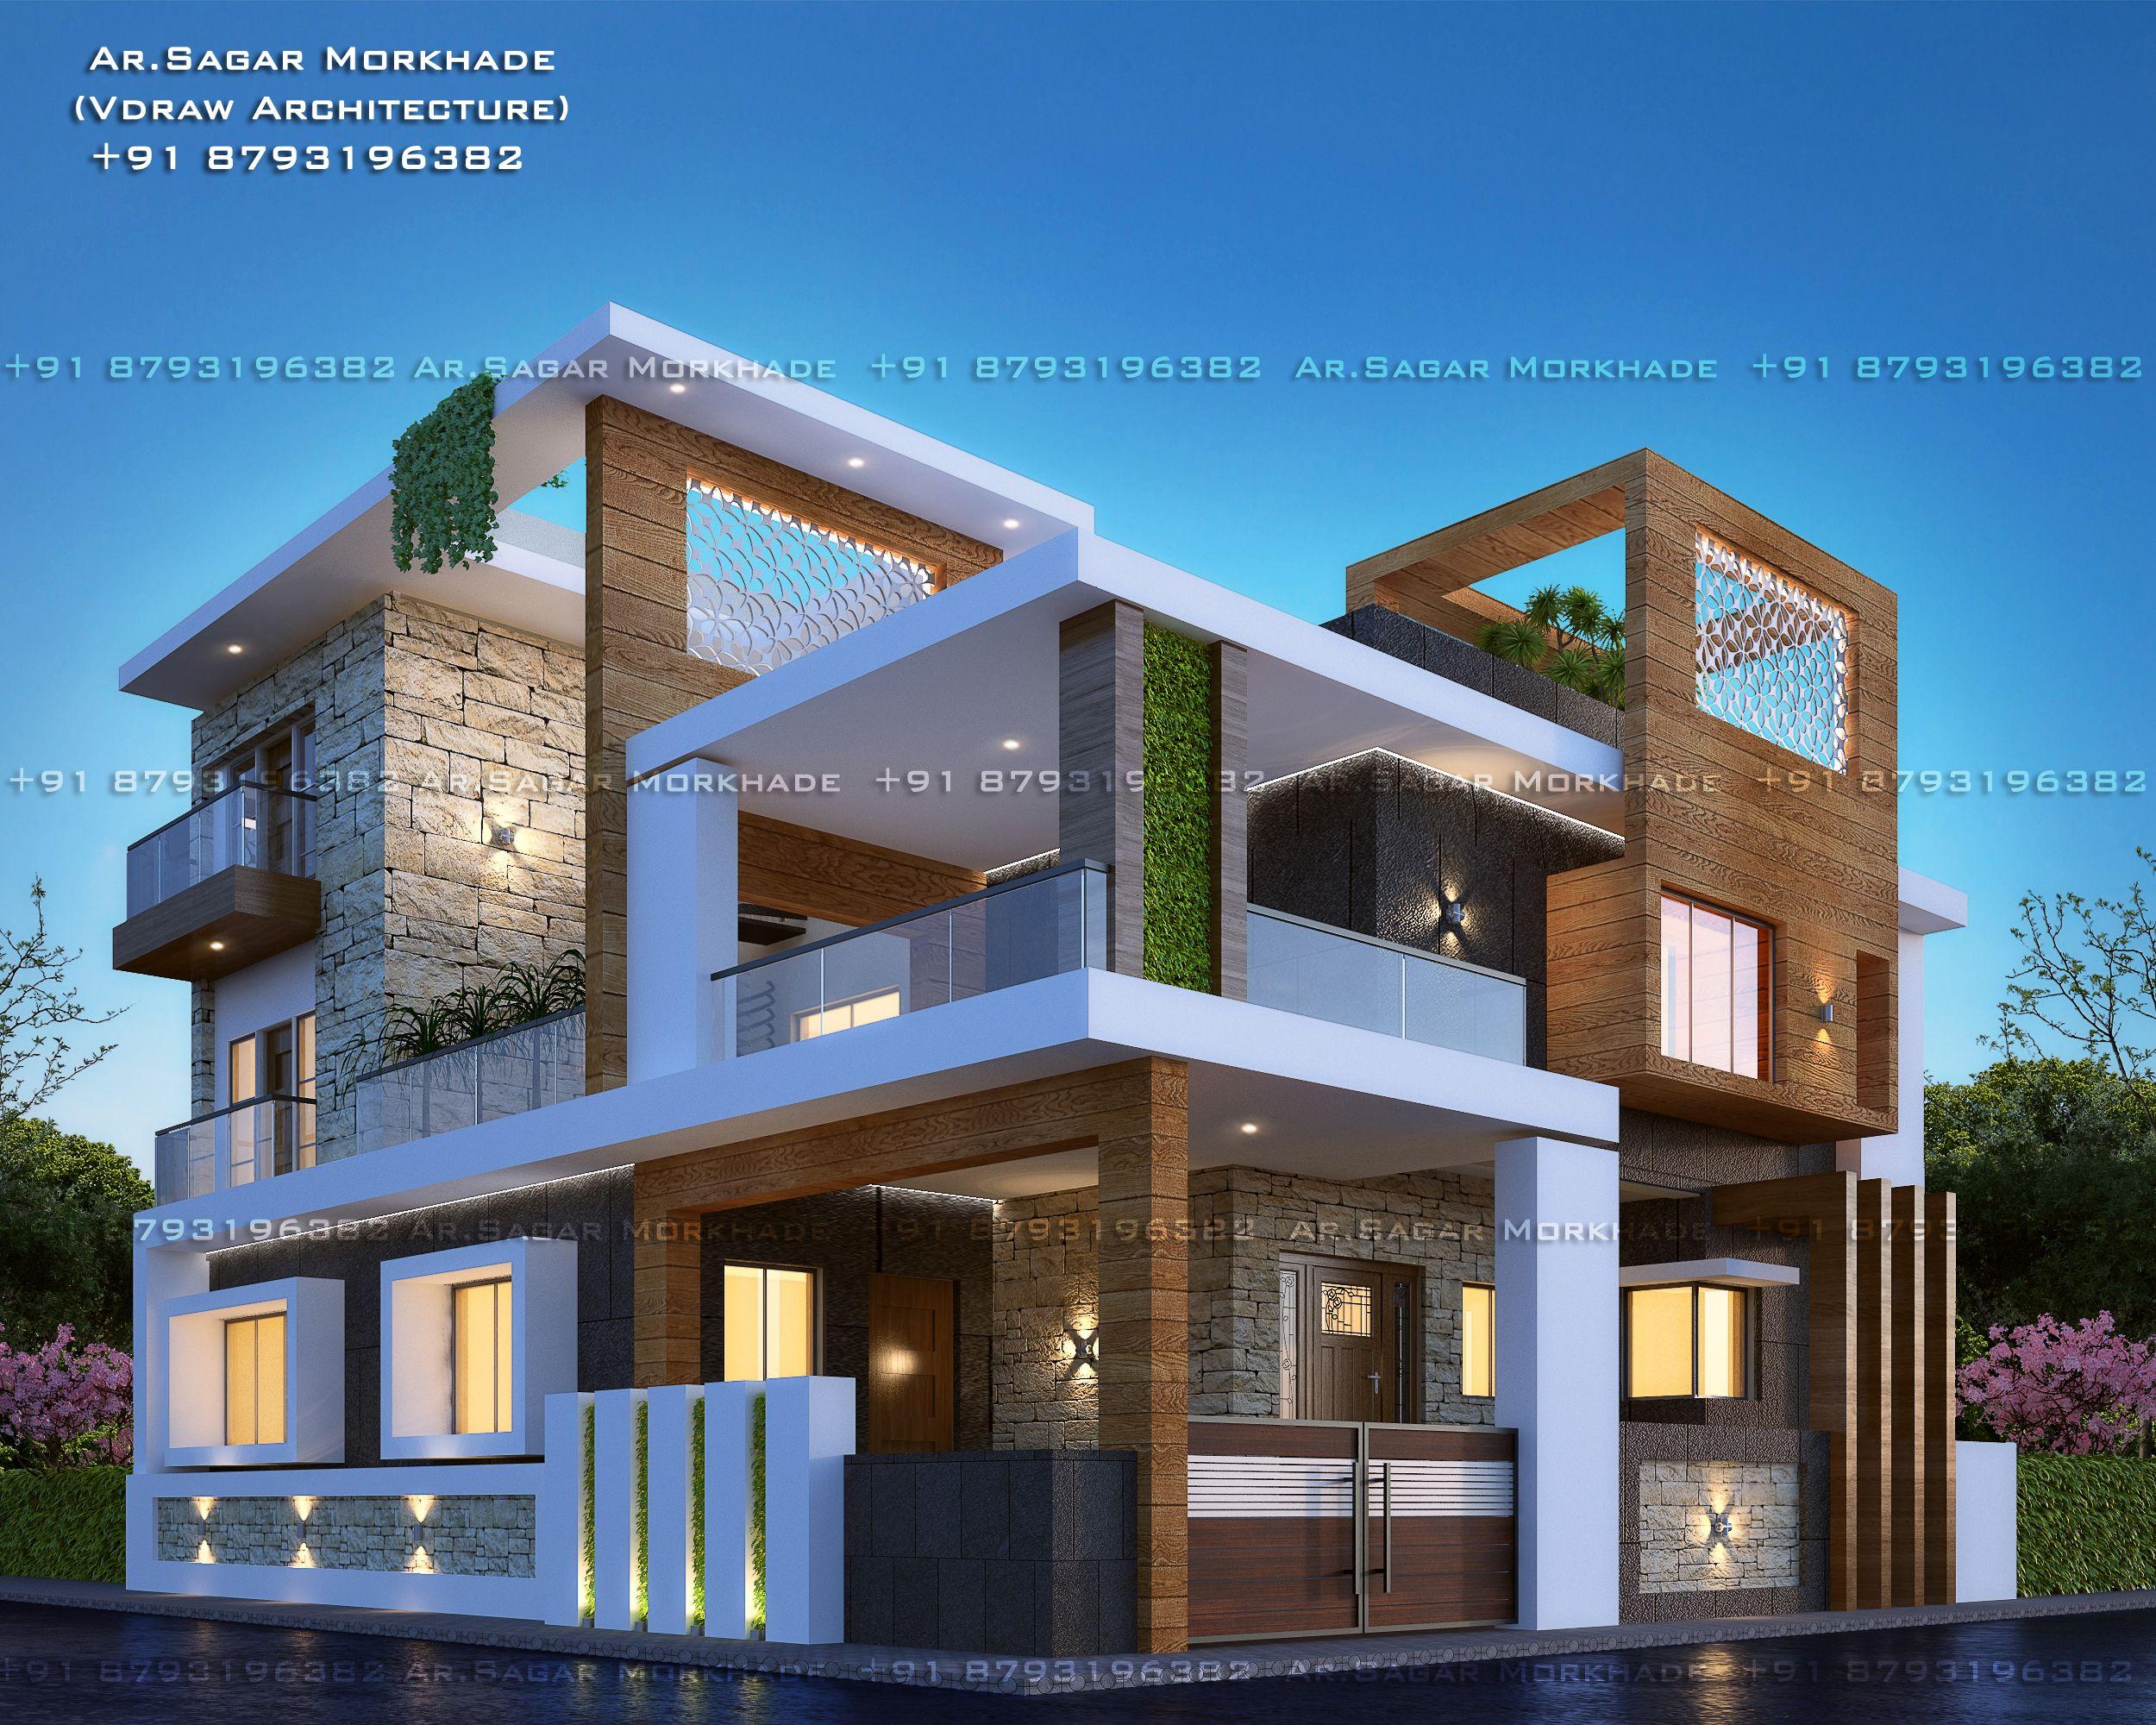 Contemporary Modern Residential House Bungalow Modern Architecture Exterior By Ar Sagar Mor House Front Design Duplex House Design House Designs Exterior